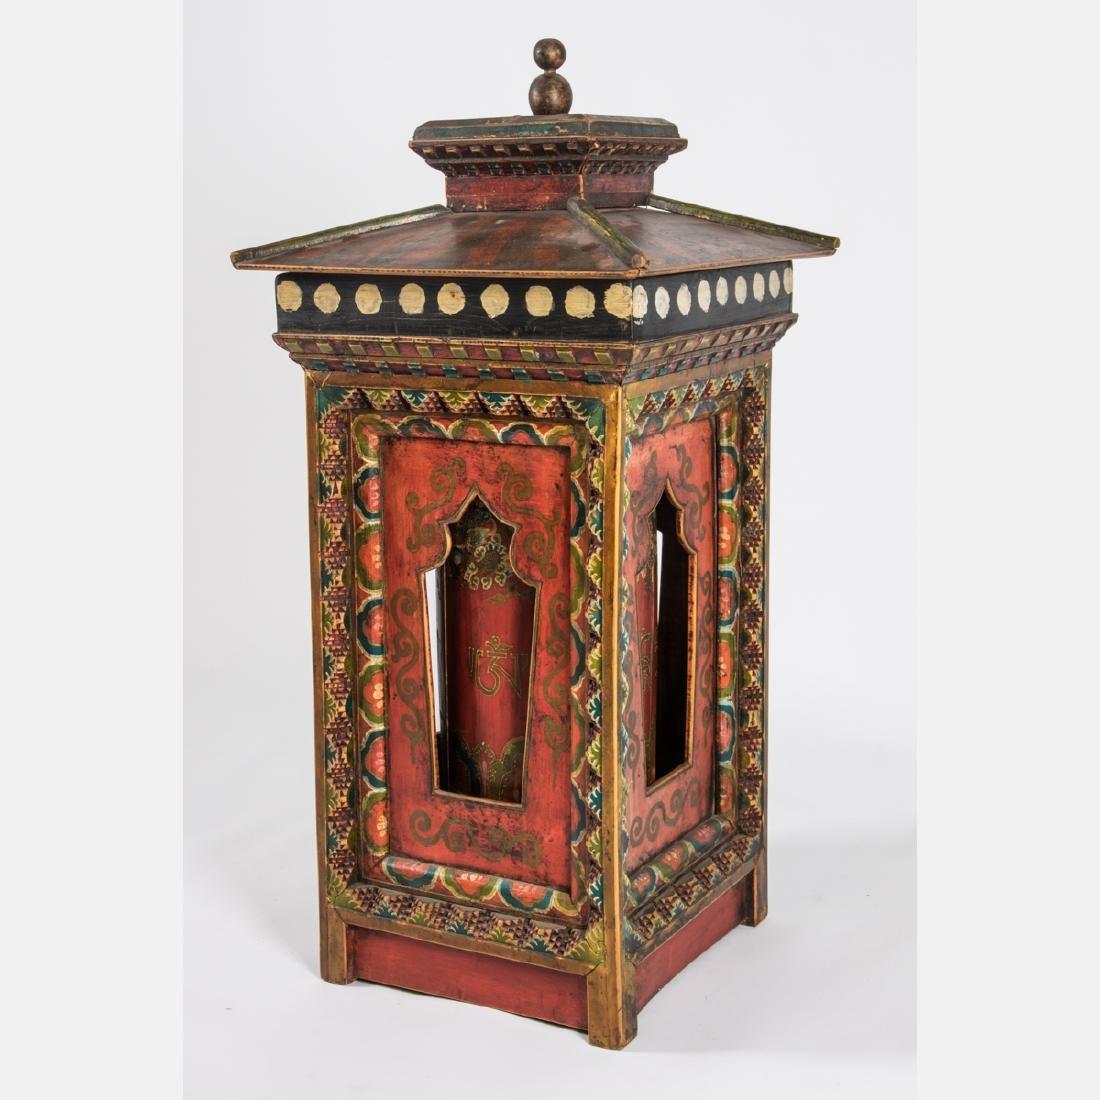 A Tibetan Polychrome Painted Wood Prayer Wheel,